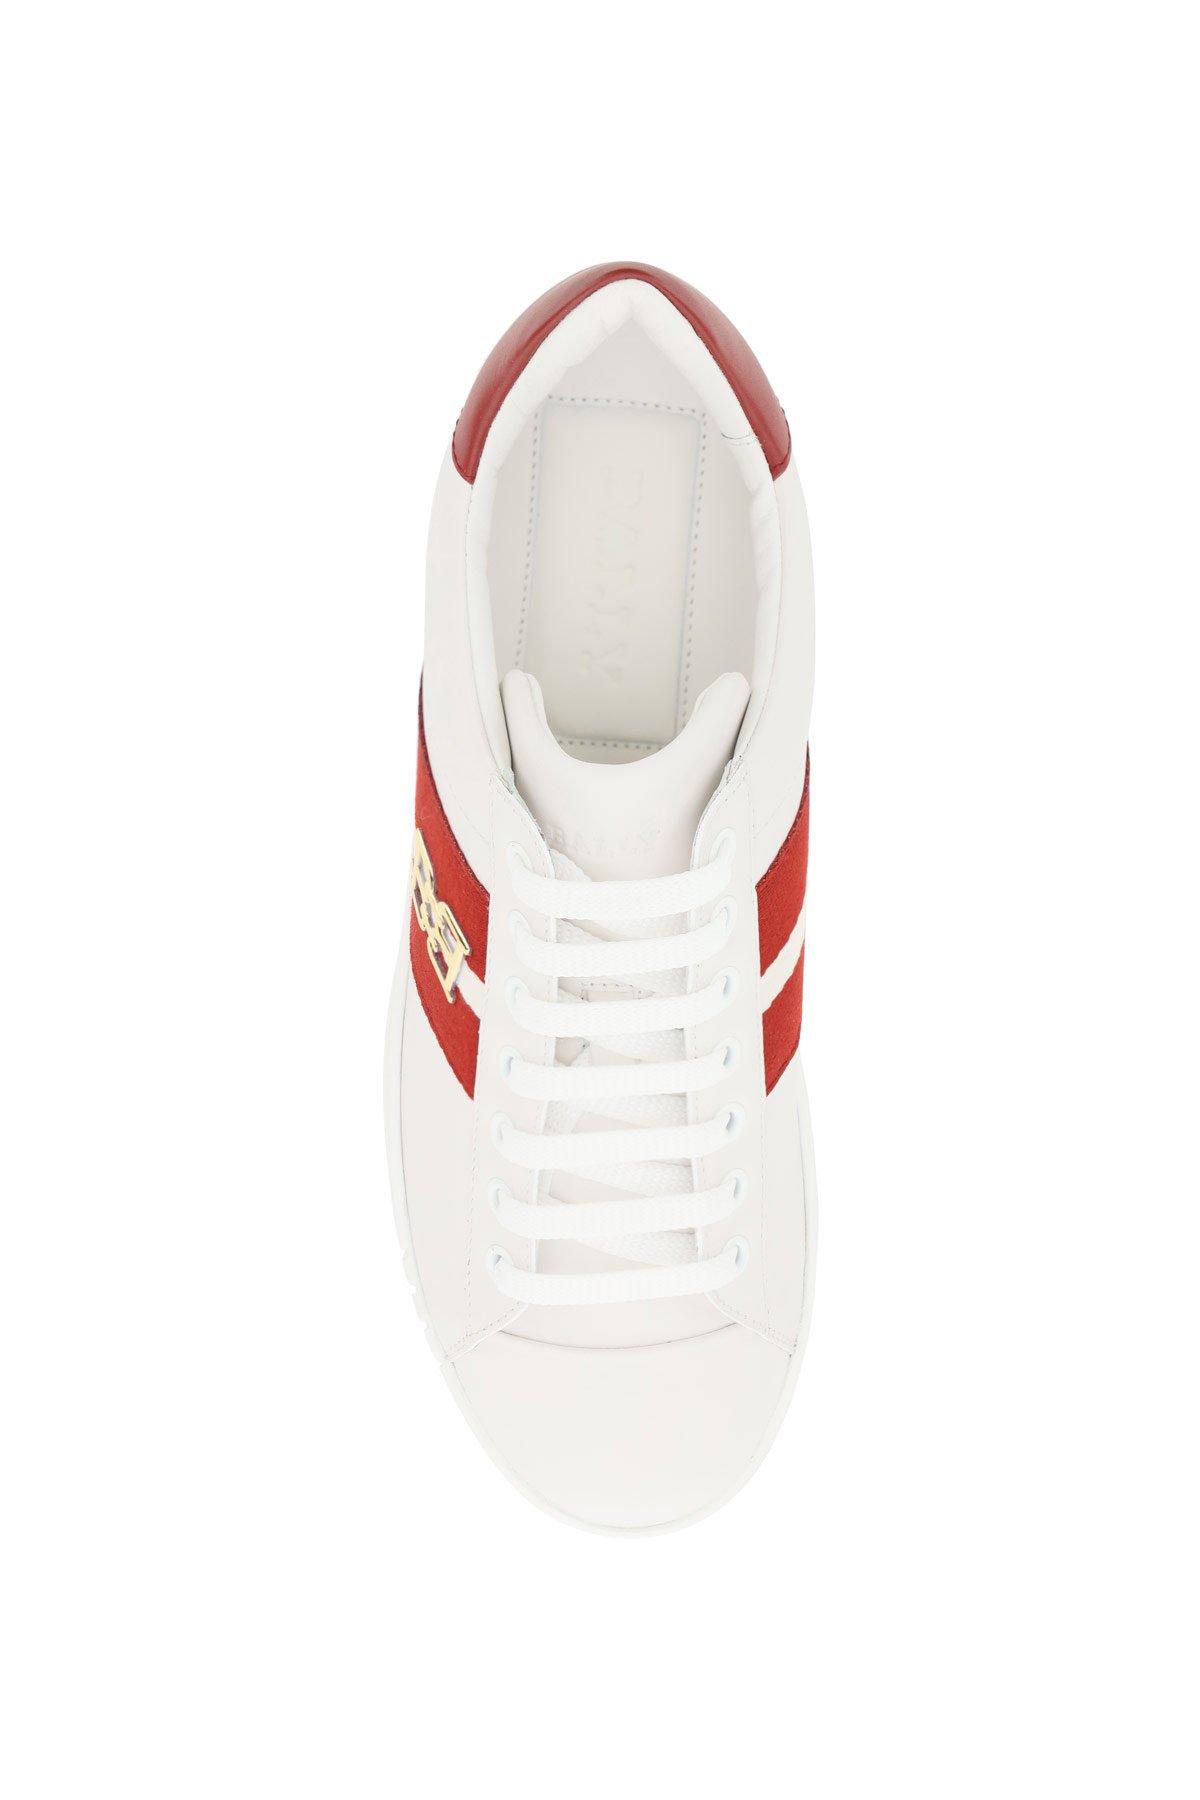 Bally sneakers viky